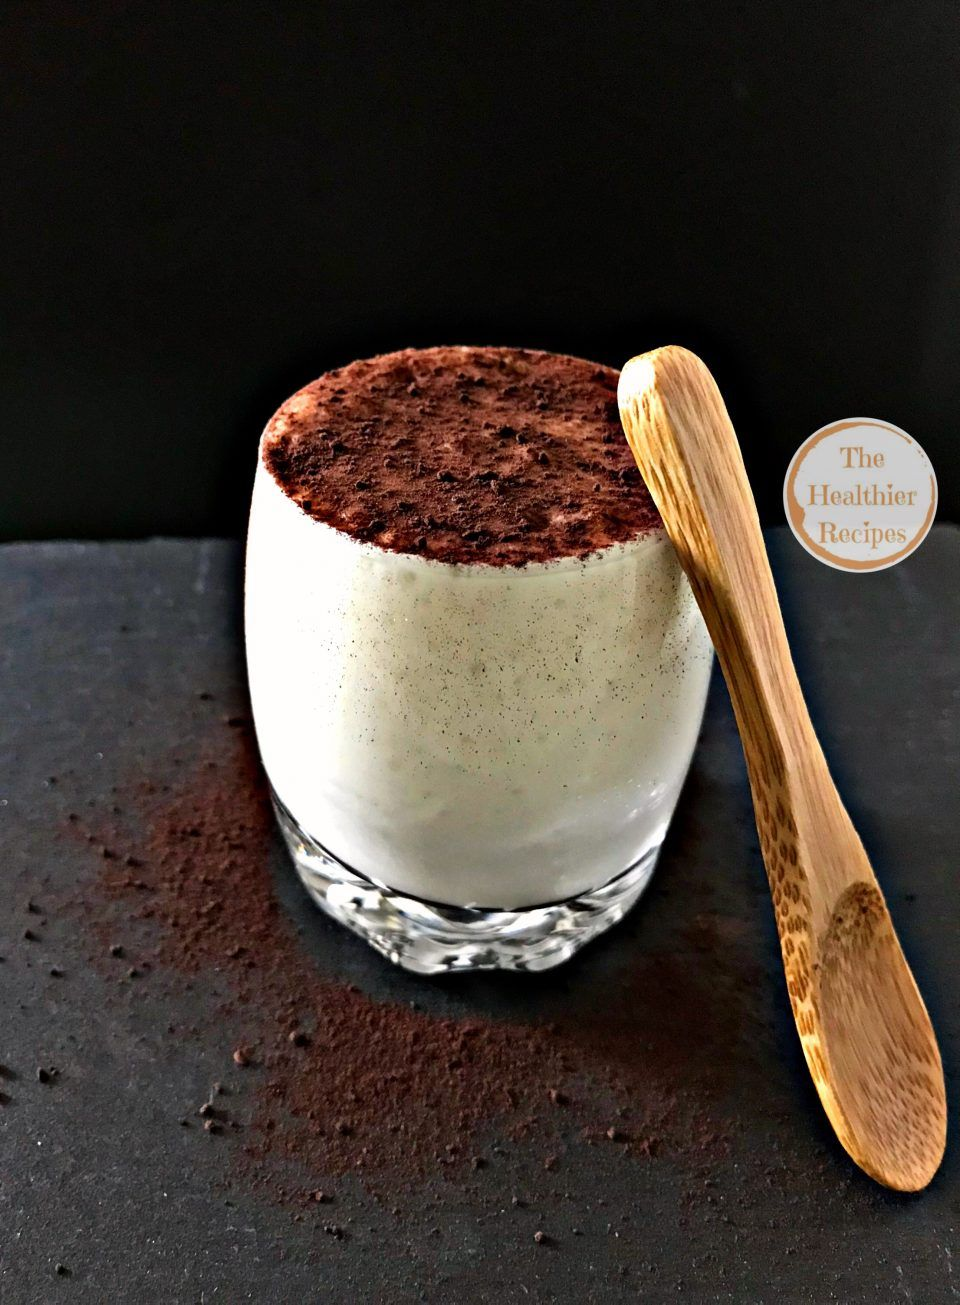 5633c70c64a2ceefaffc2ad67fdf0479 - Ricette Yogurt Greco